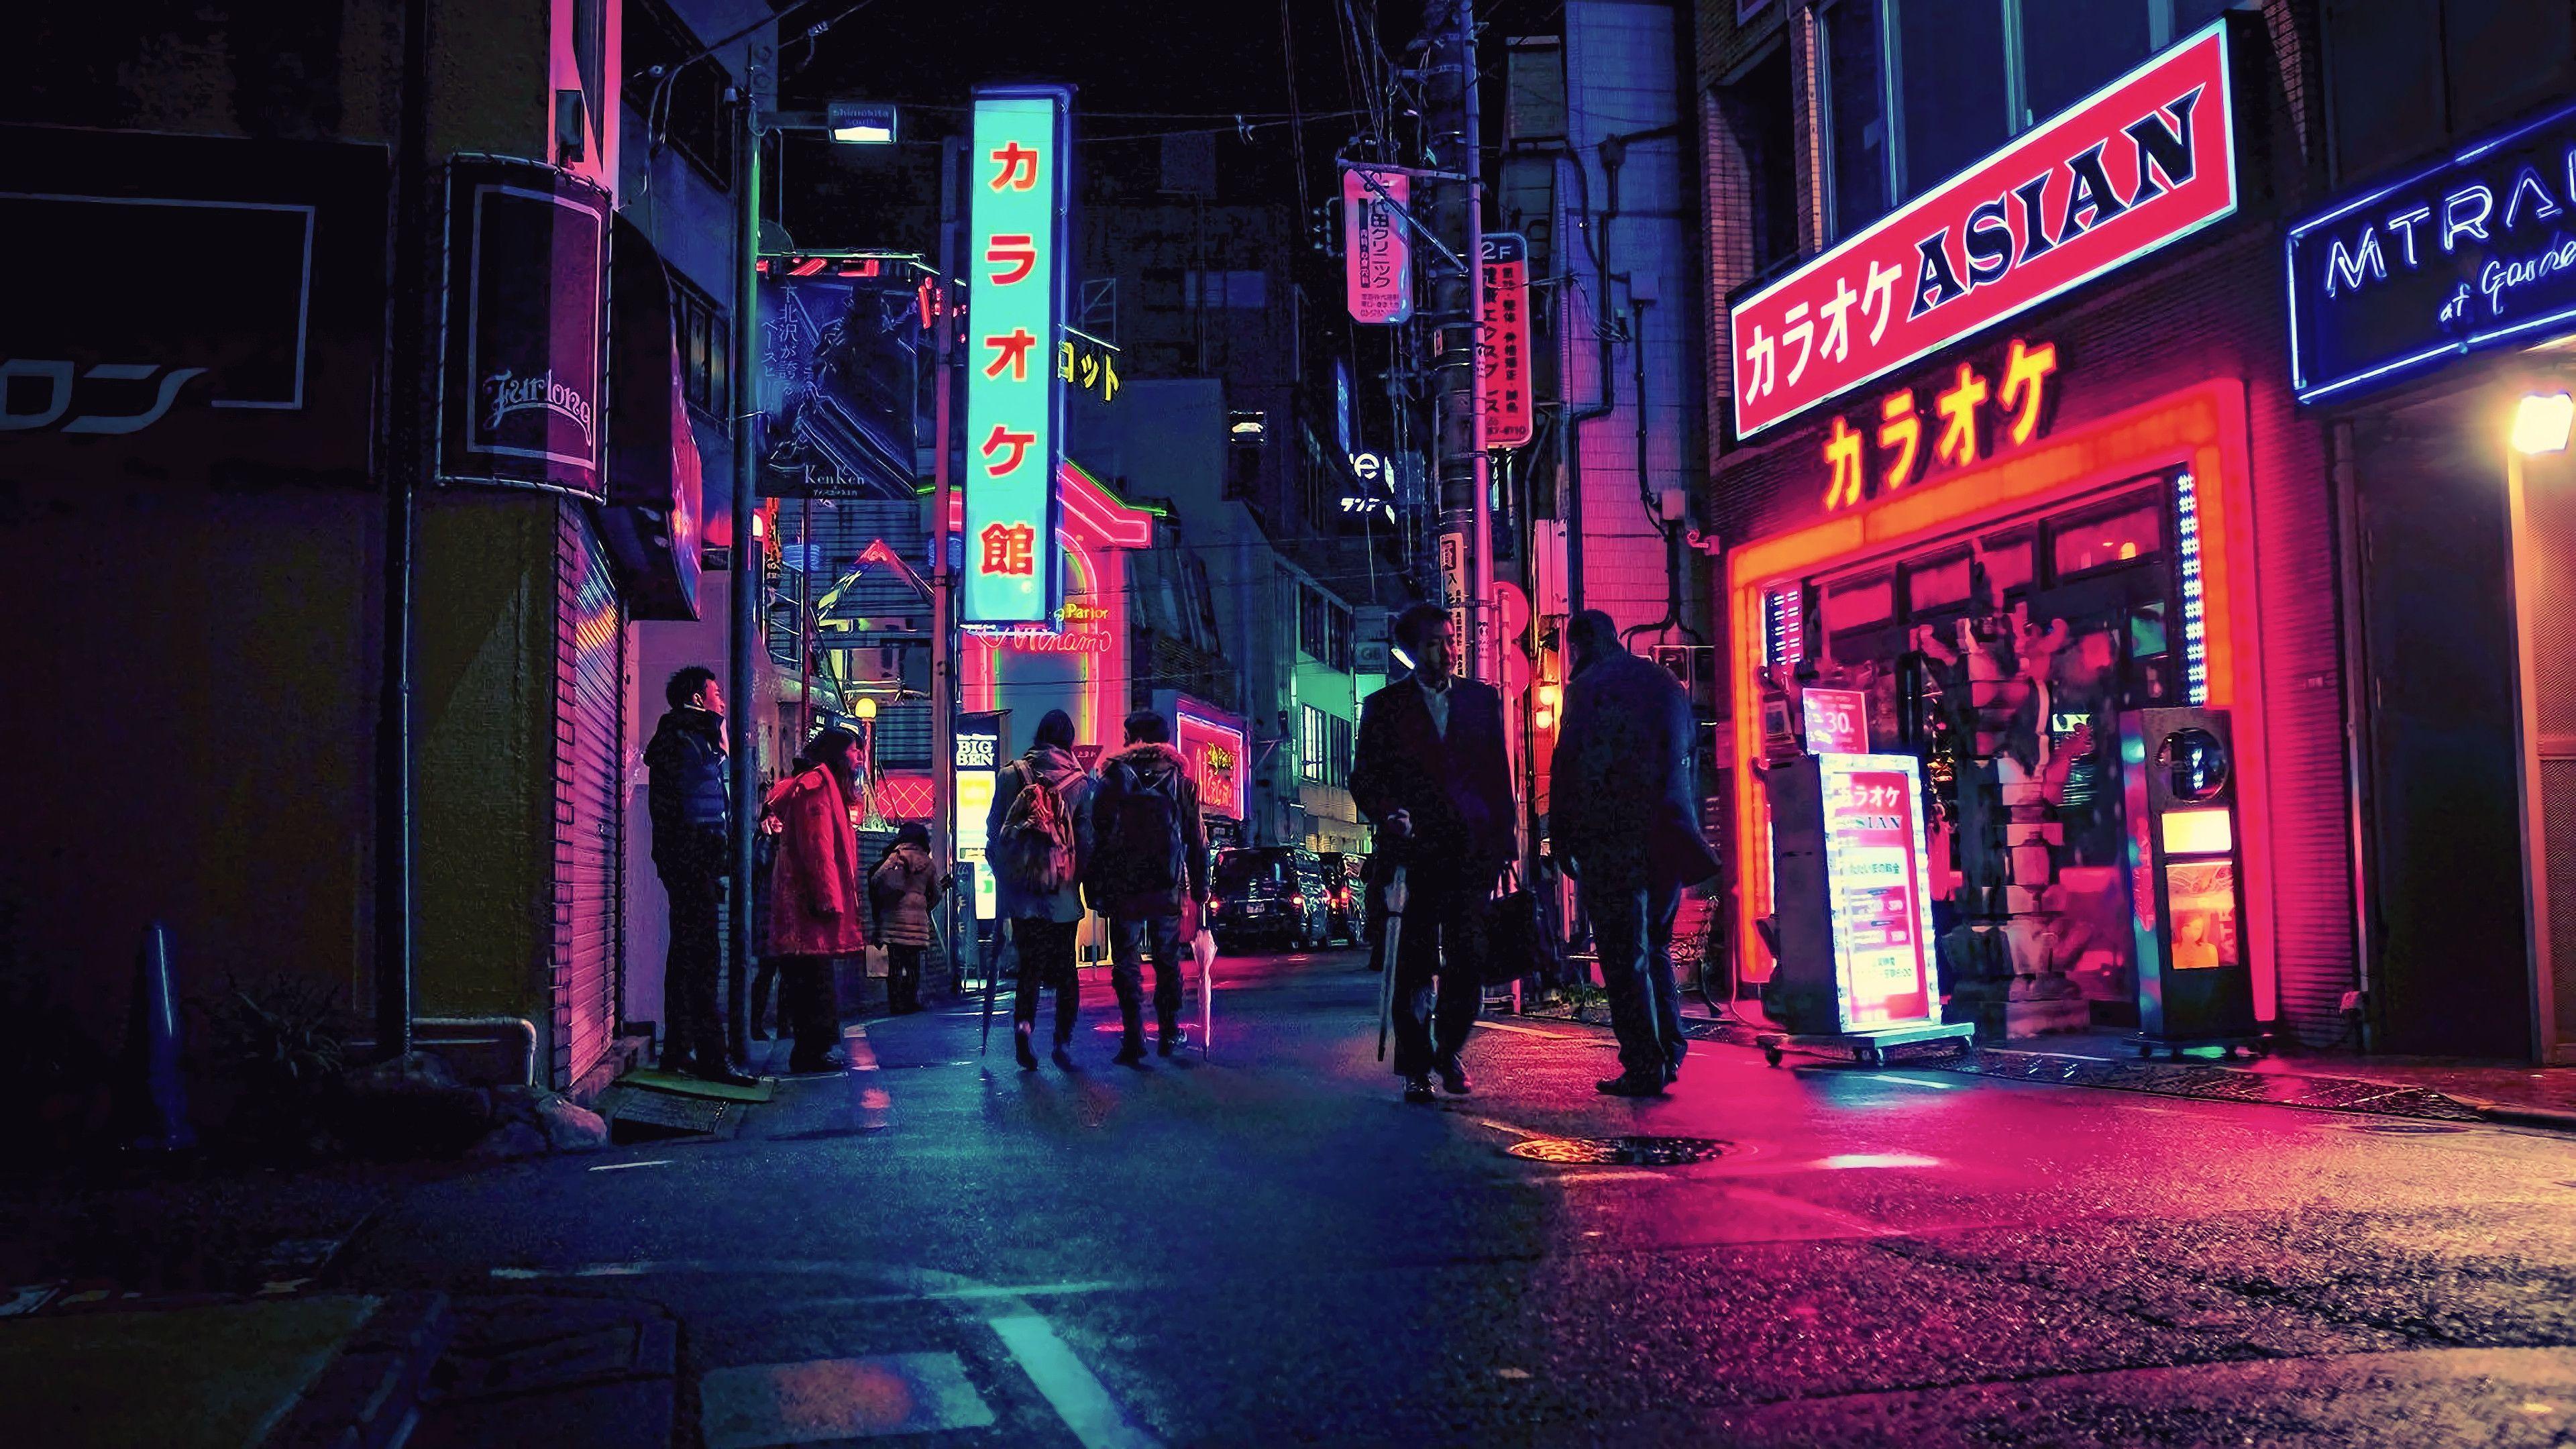 Neon Japan [3840x2160] Fond ecran, Écran